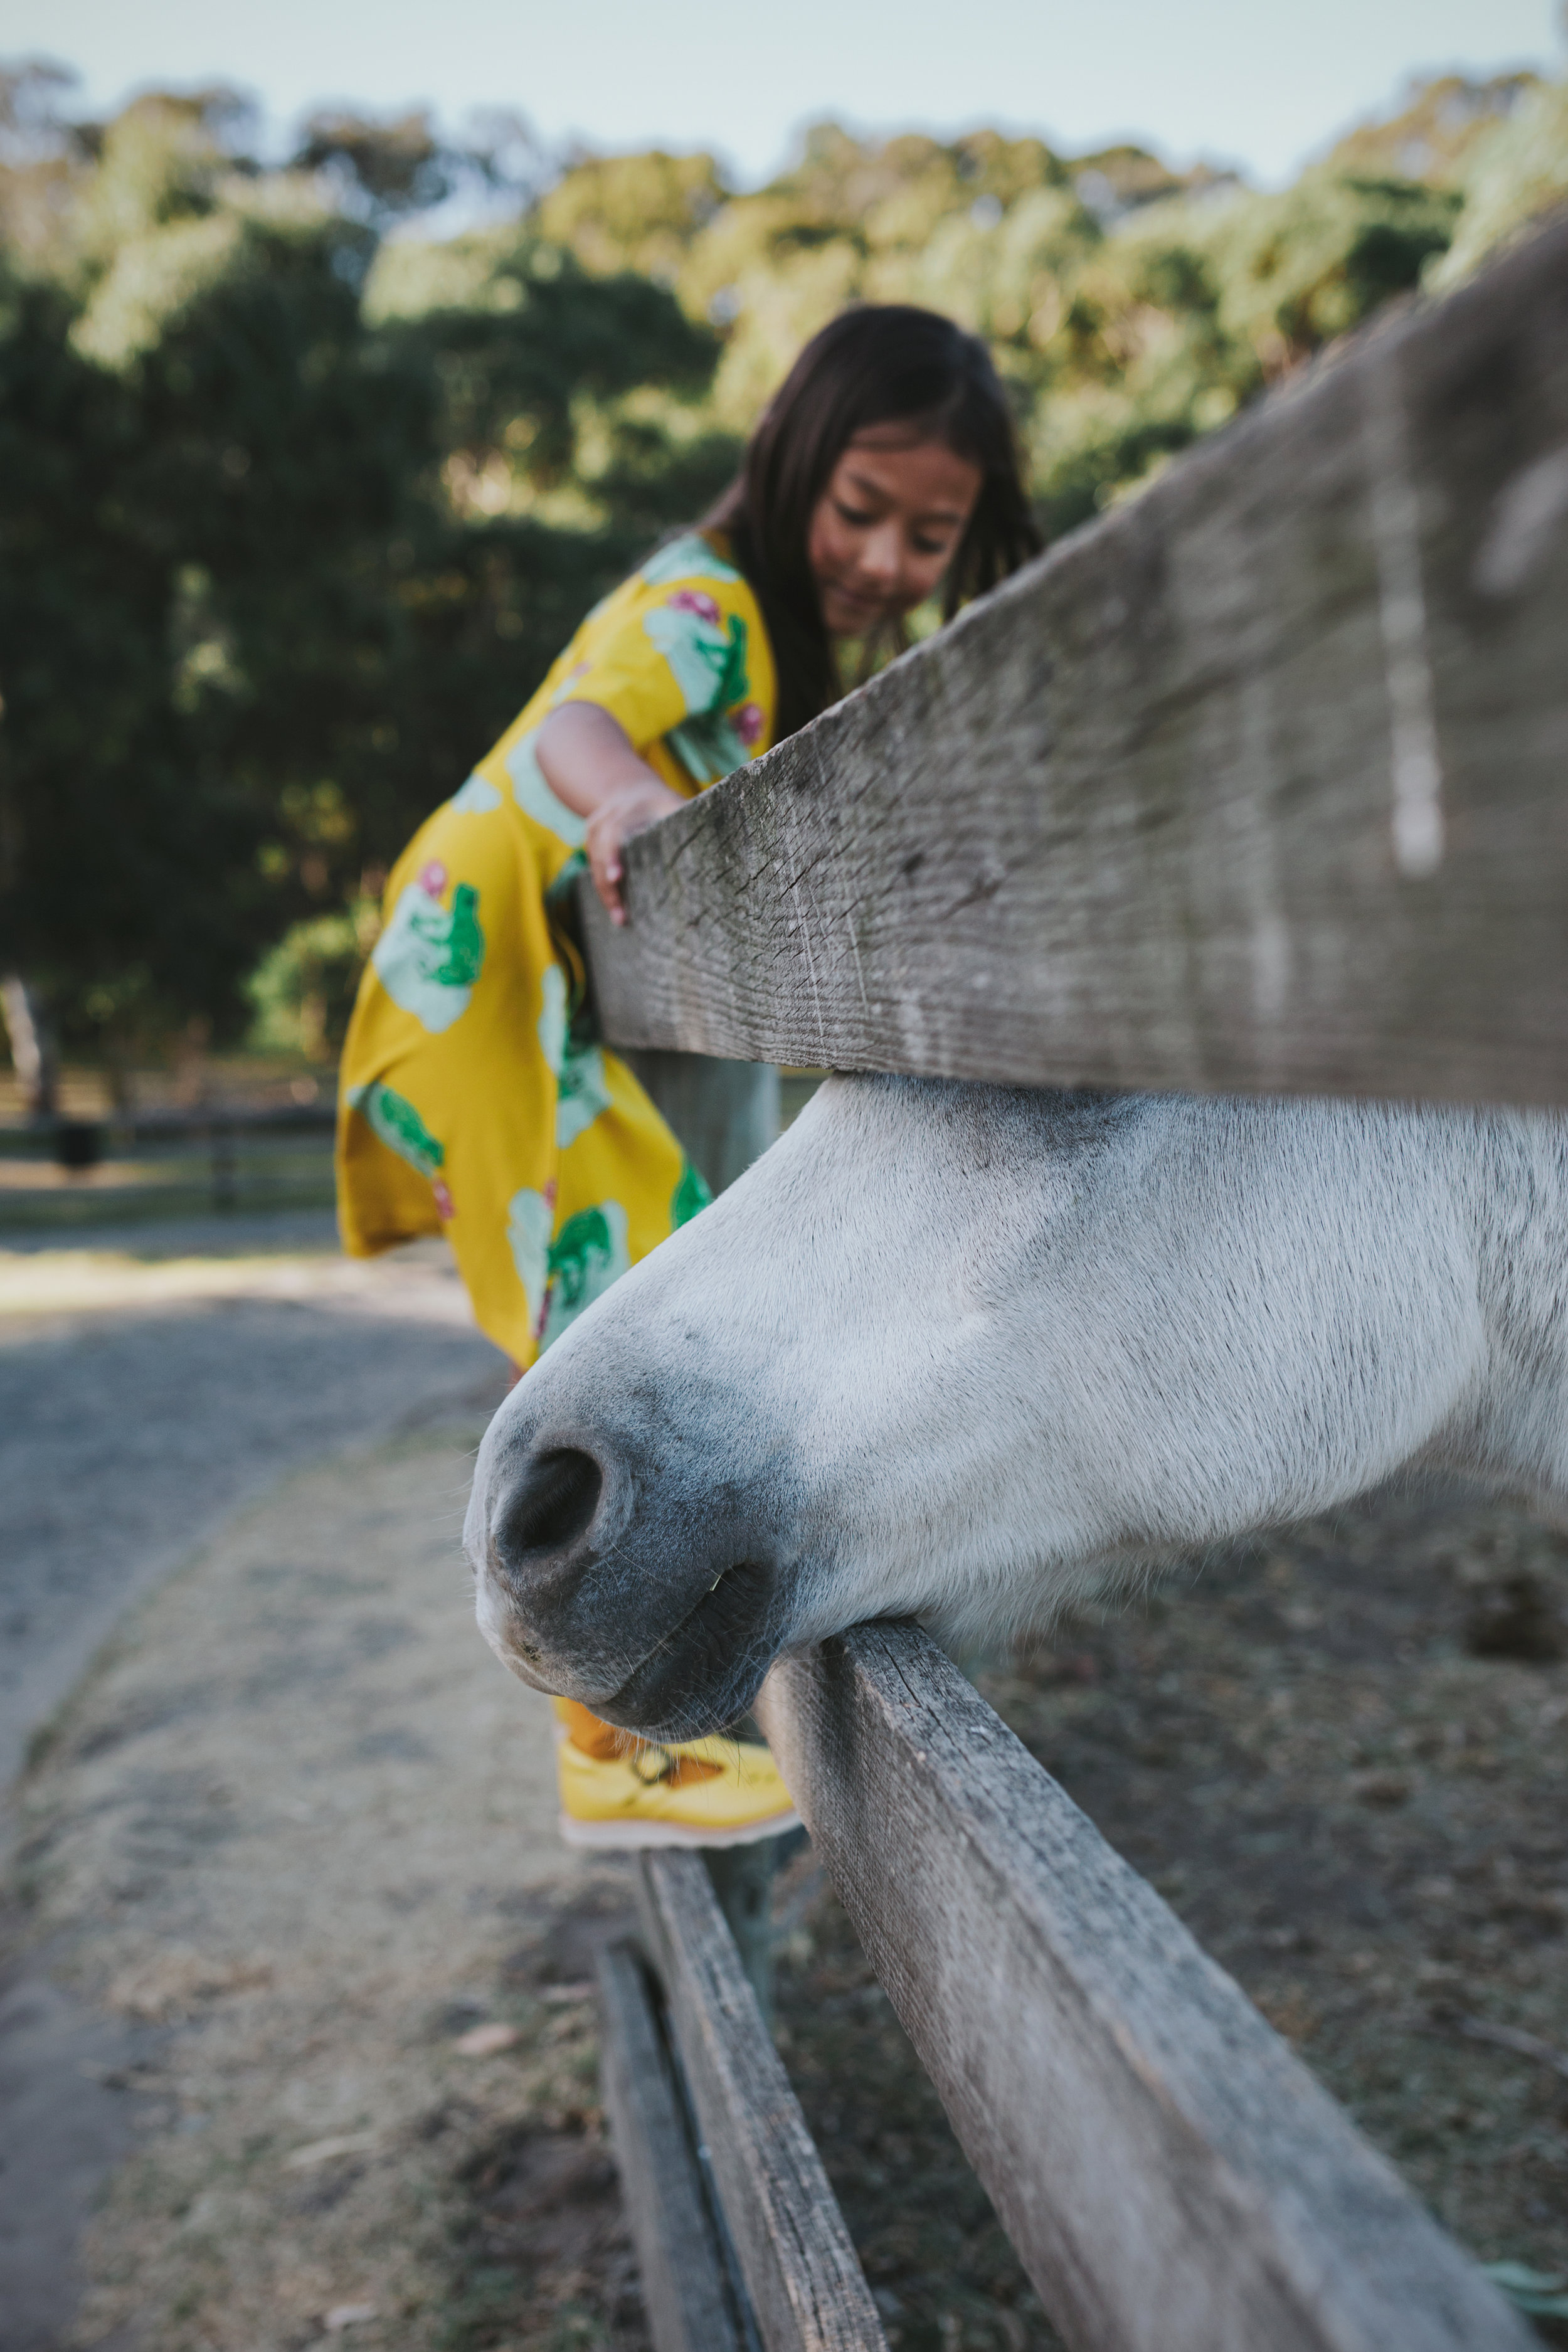 horse-nose-fence-kids-commercial-photographer-siida-tasmania.jpg